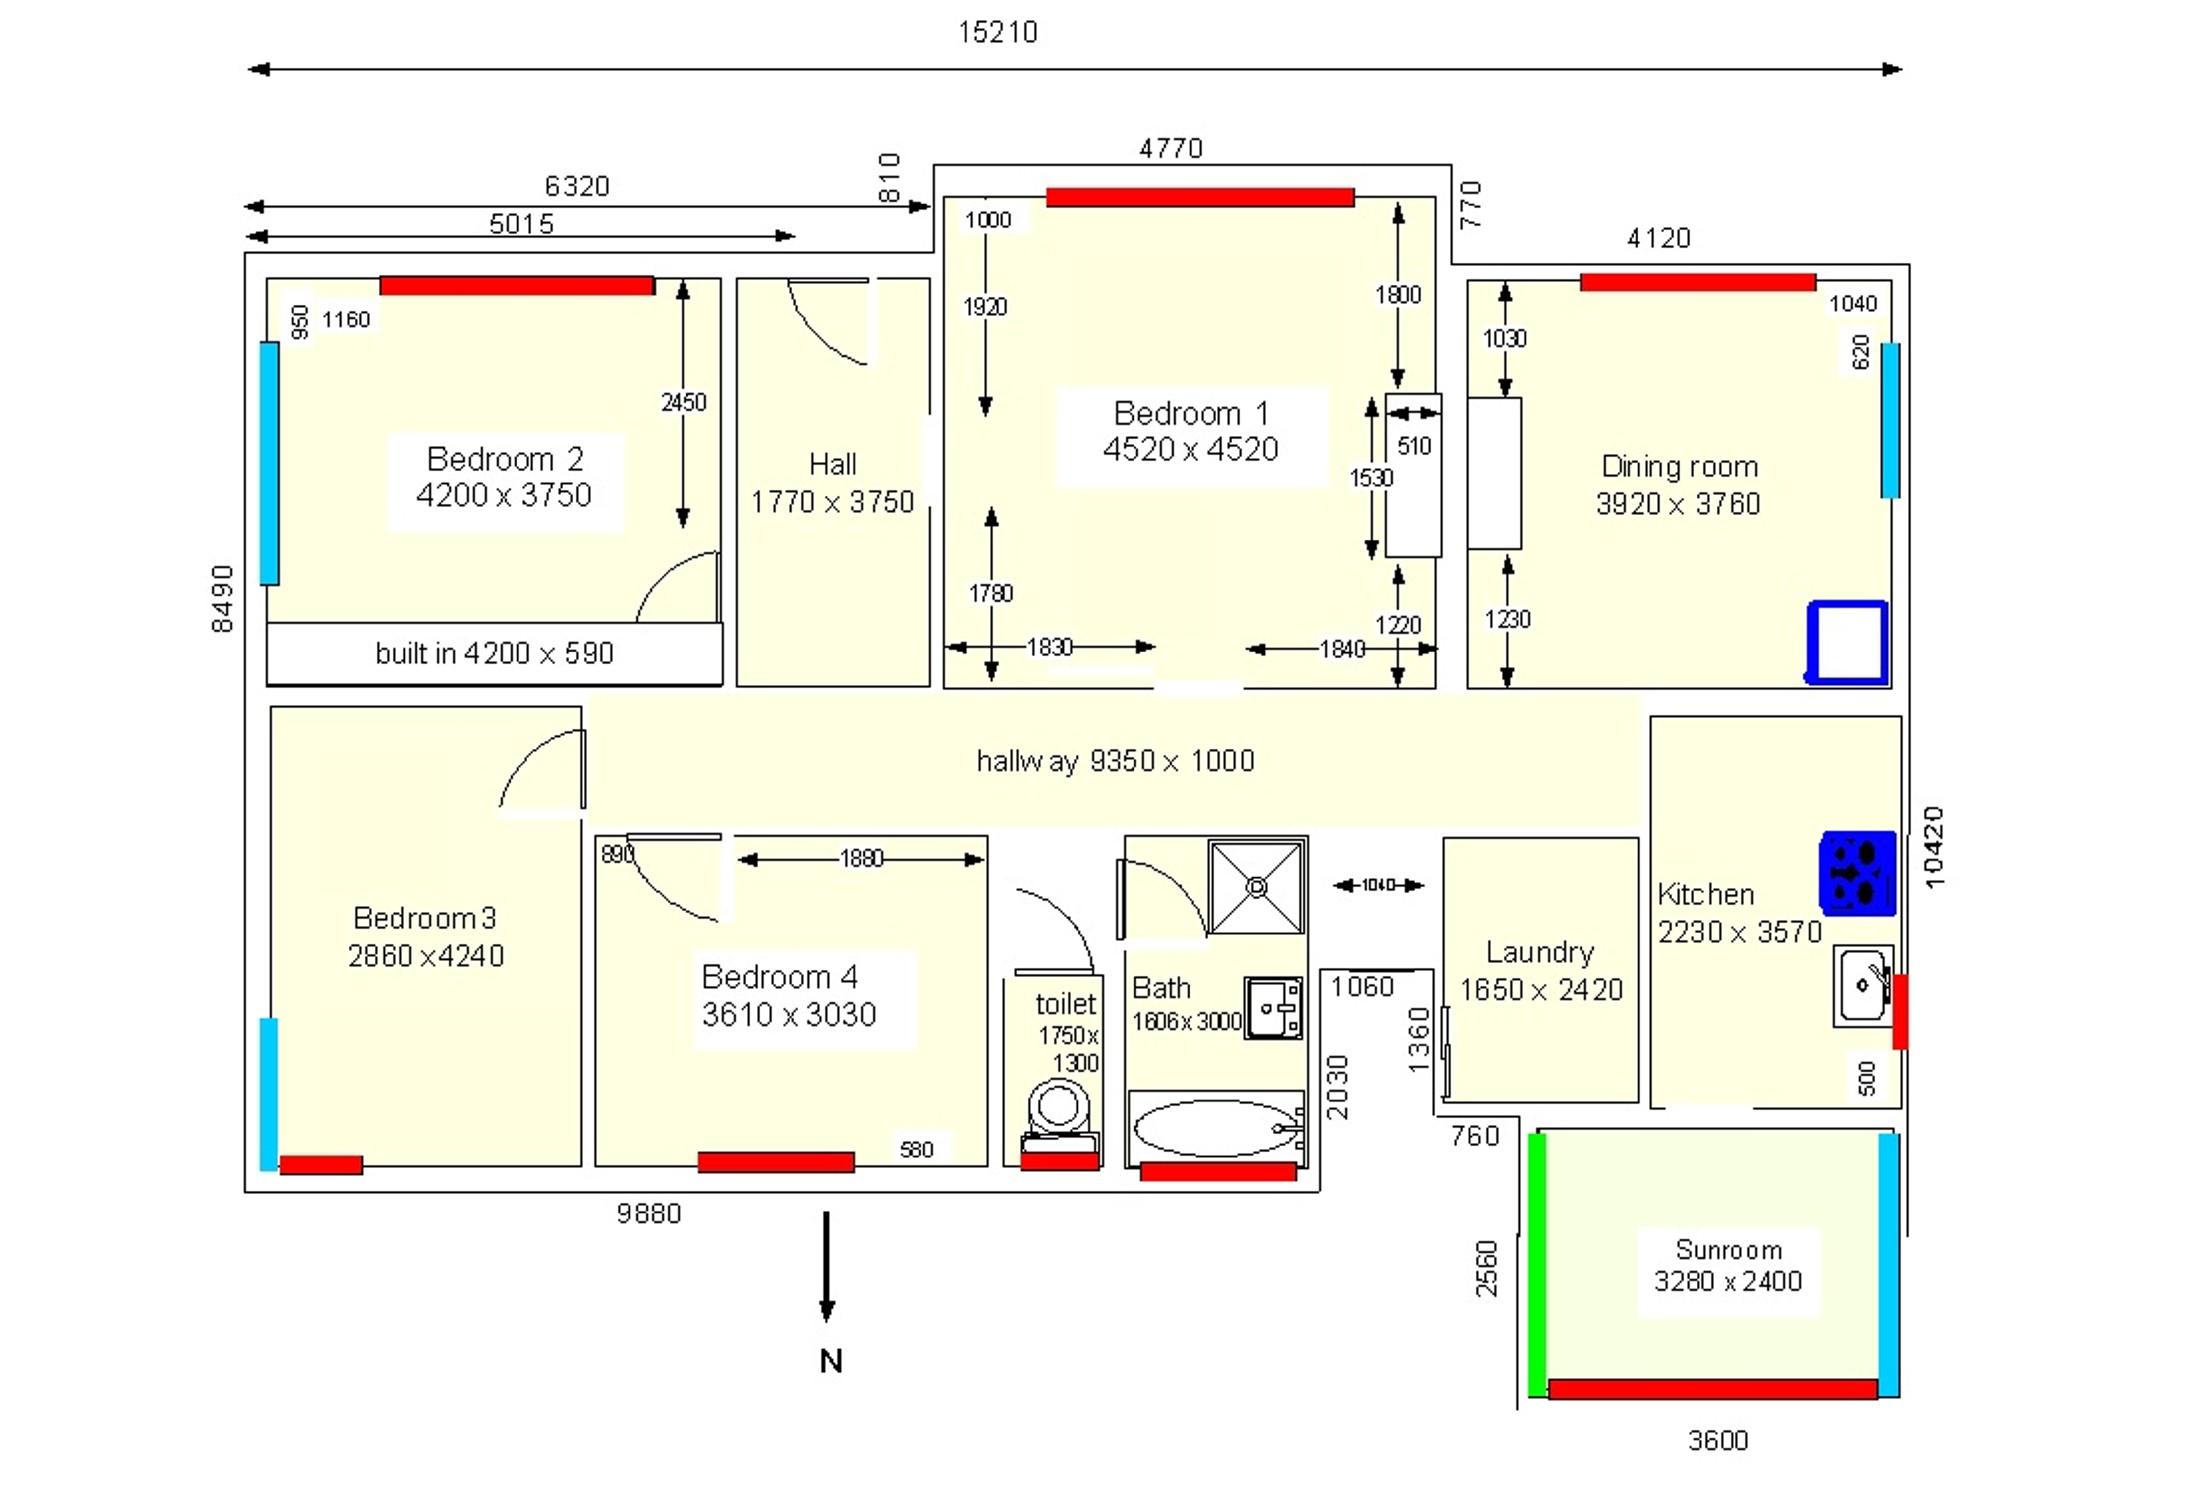 Home Design Visio Stencils House Style Ideas